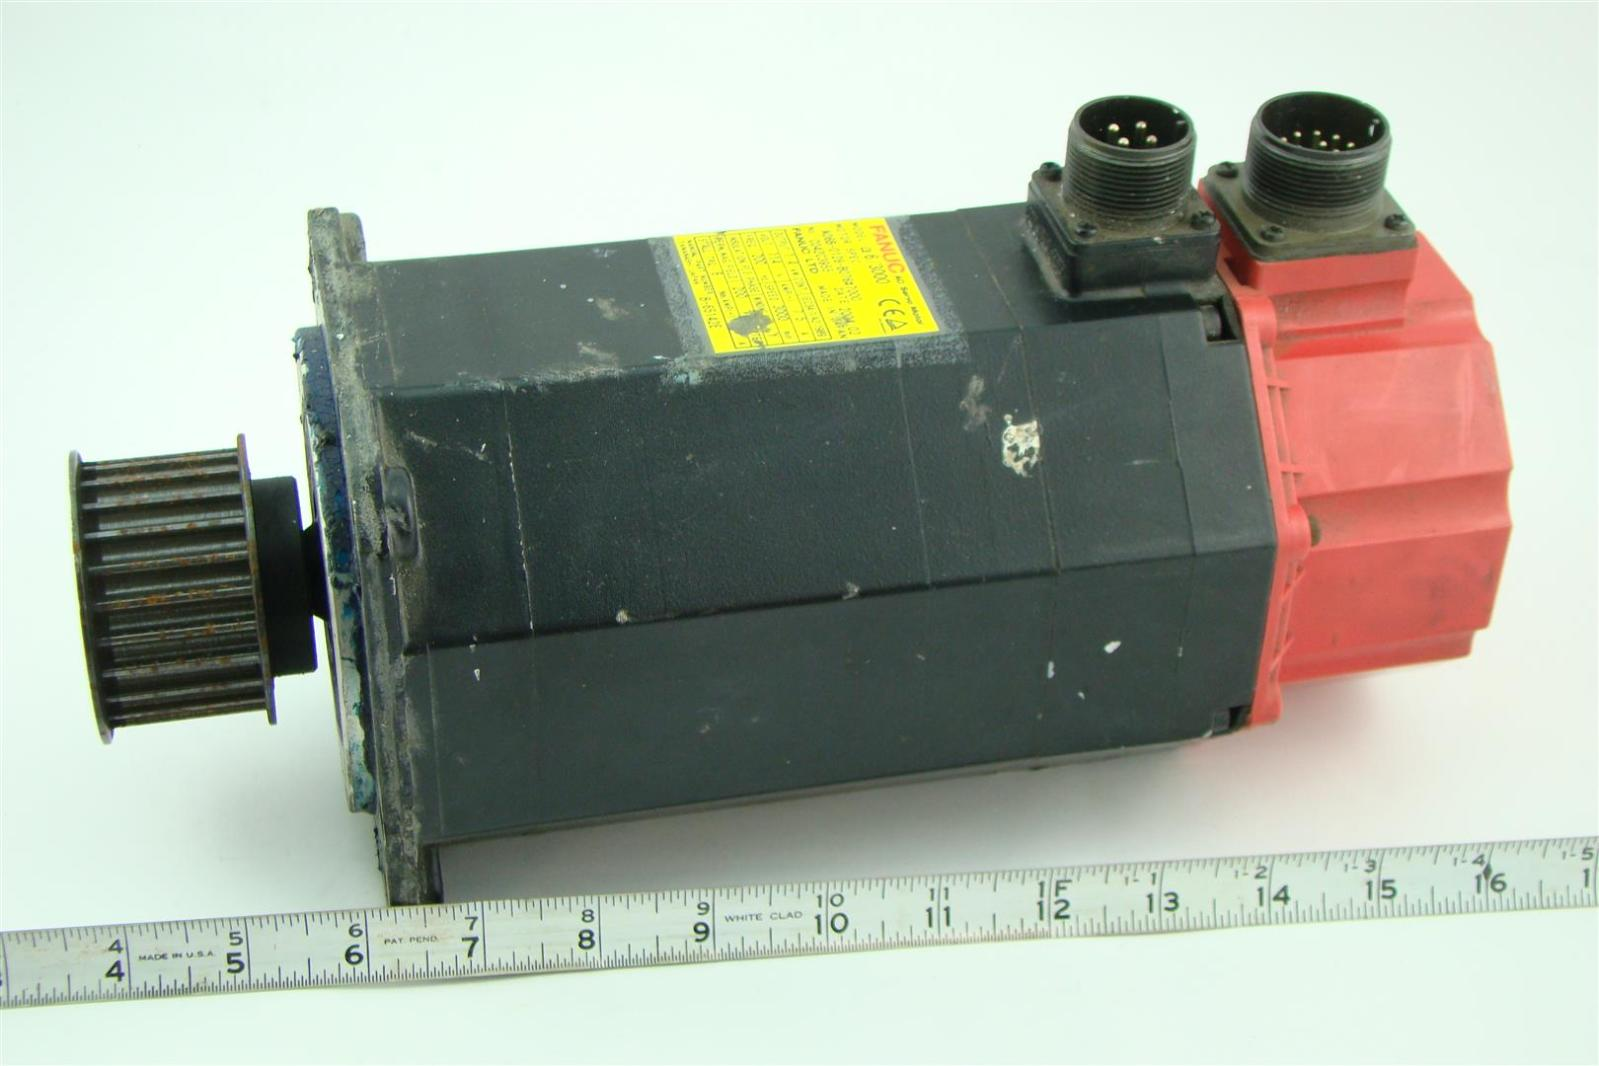 Fanuc Ac Servo Motor Model 6 3000 A06b 0128 B076 7000 7 5a 200hz 114v 1 4kw Joseph